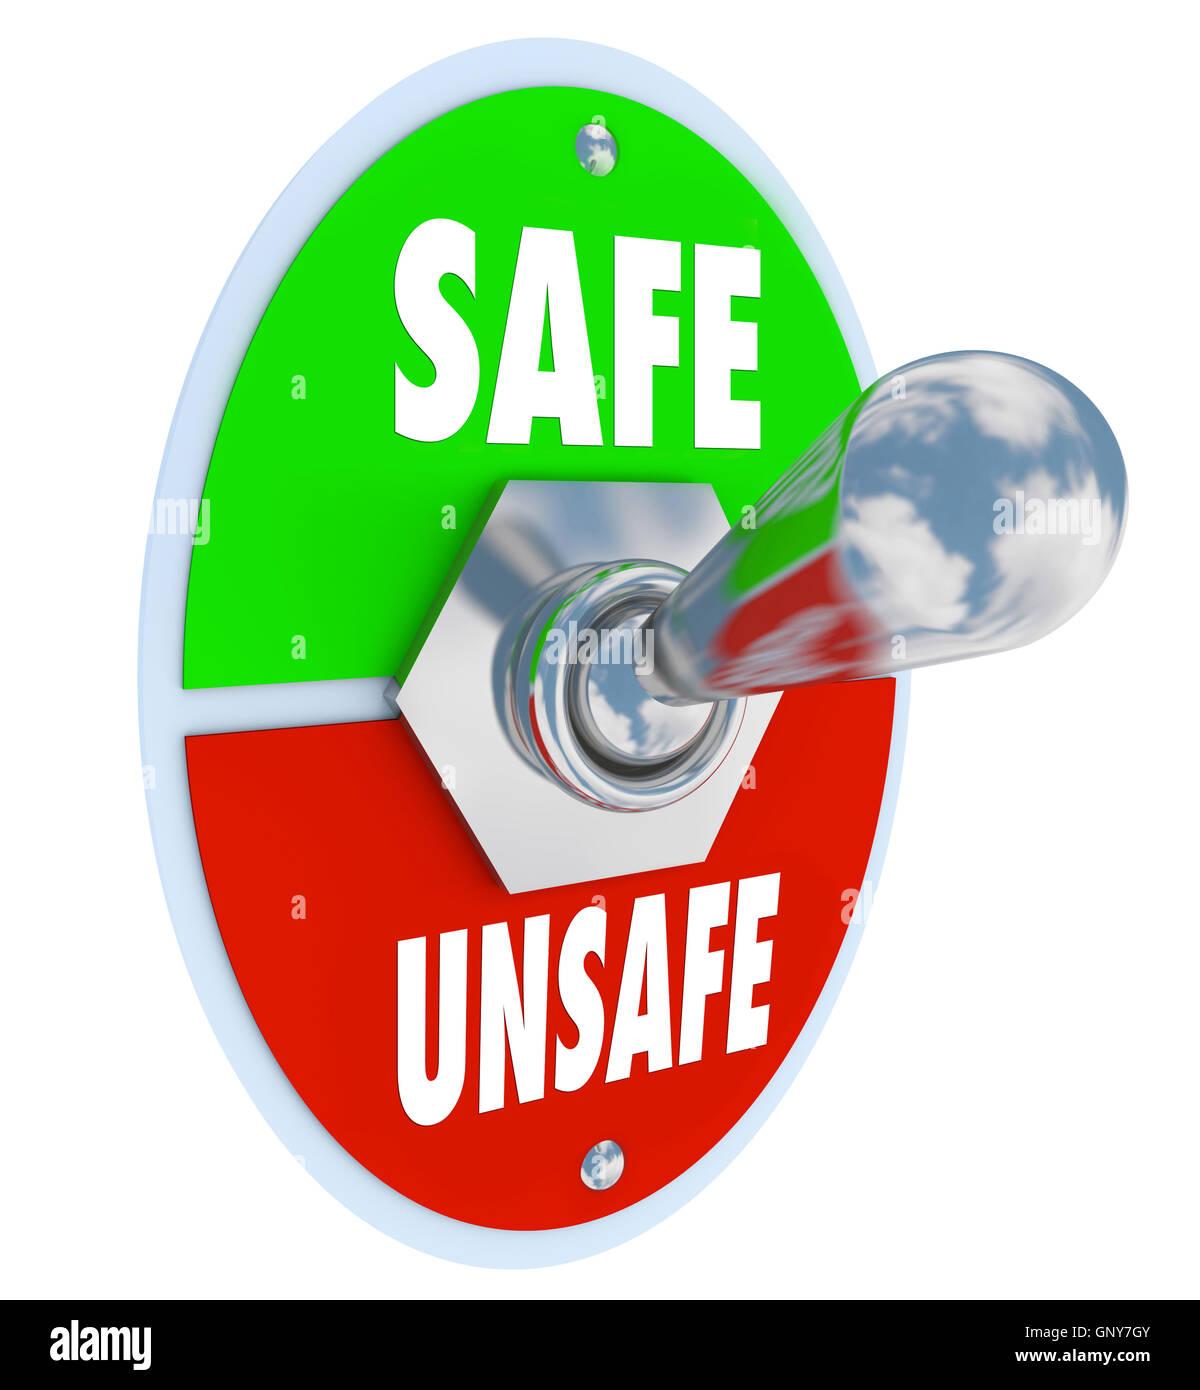 Safe Or Unsafe Toggle Switch Choose Safety Vs Danger Stock